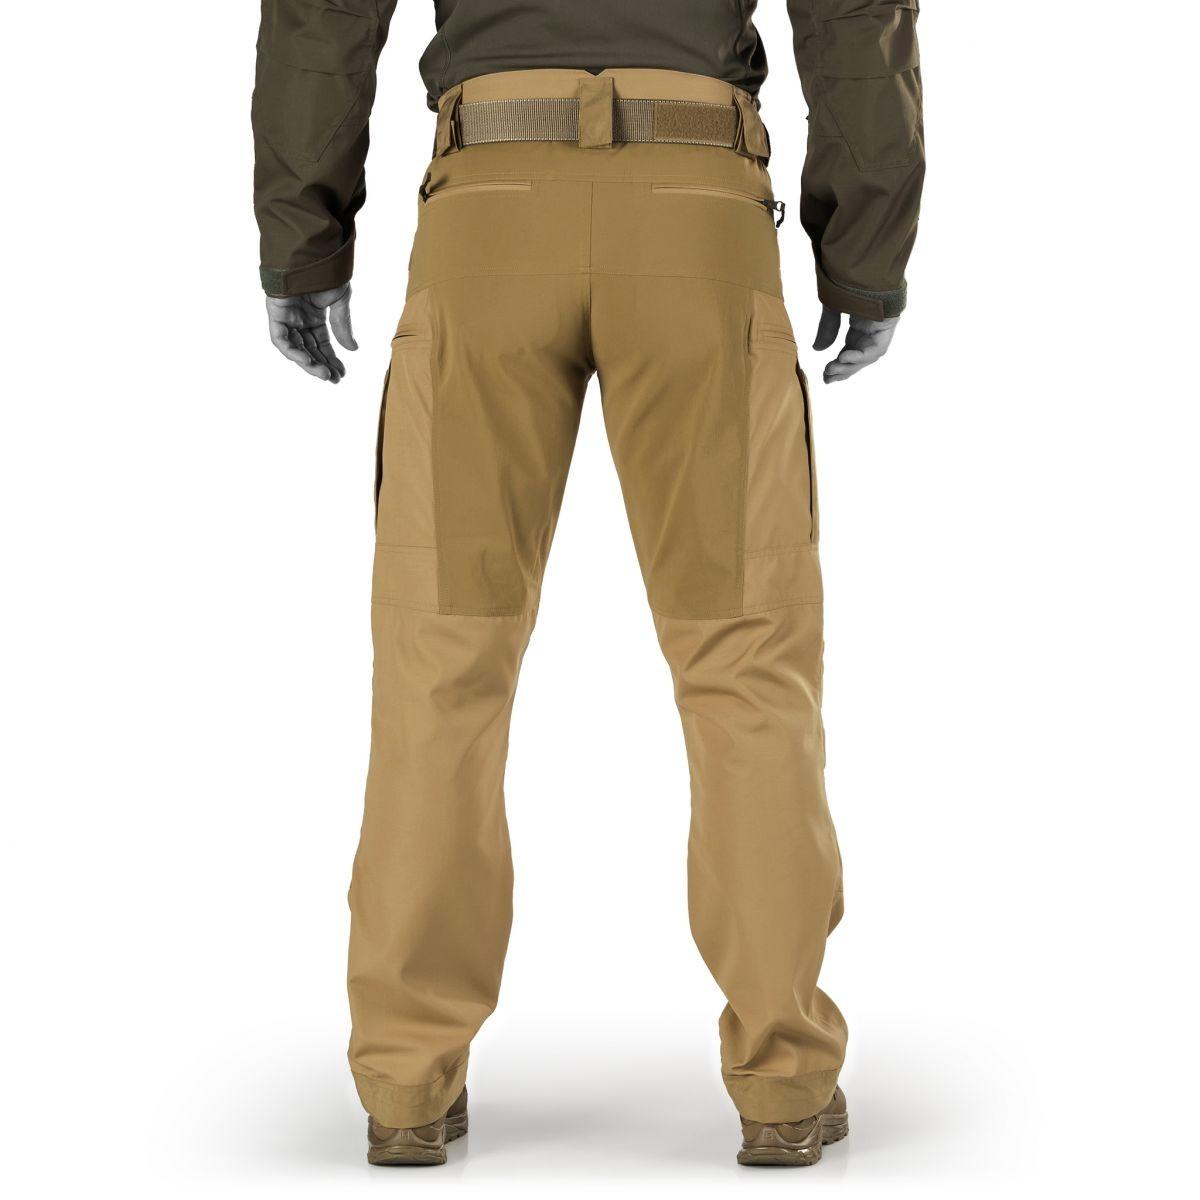 Pantalón P40 All-Terrain Gen 2